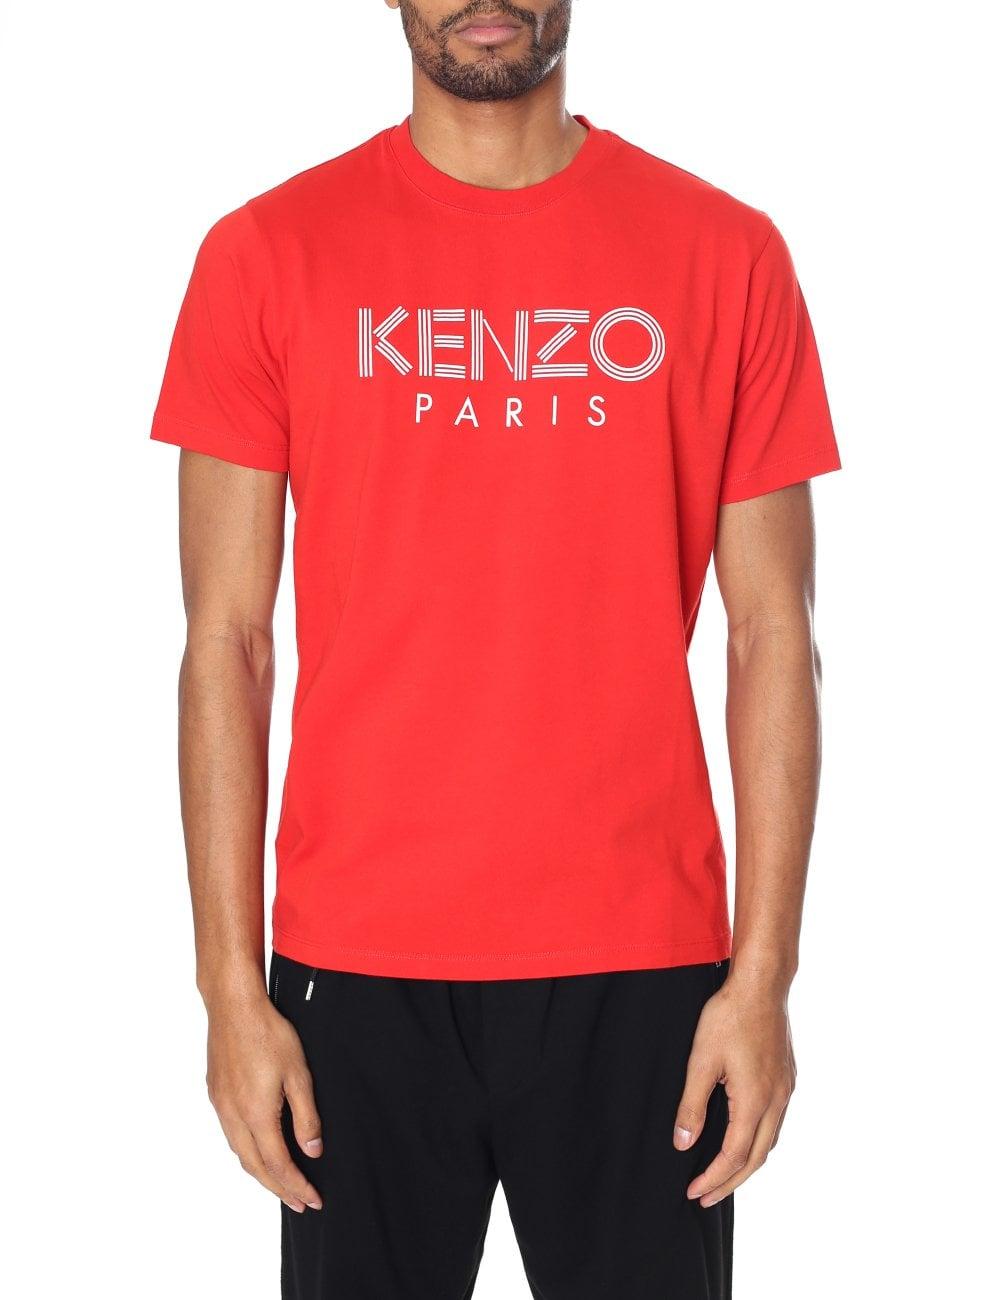 f6c3caaa Kenzo Men's Classic Kenzo Paris Tee